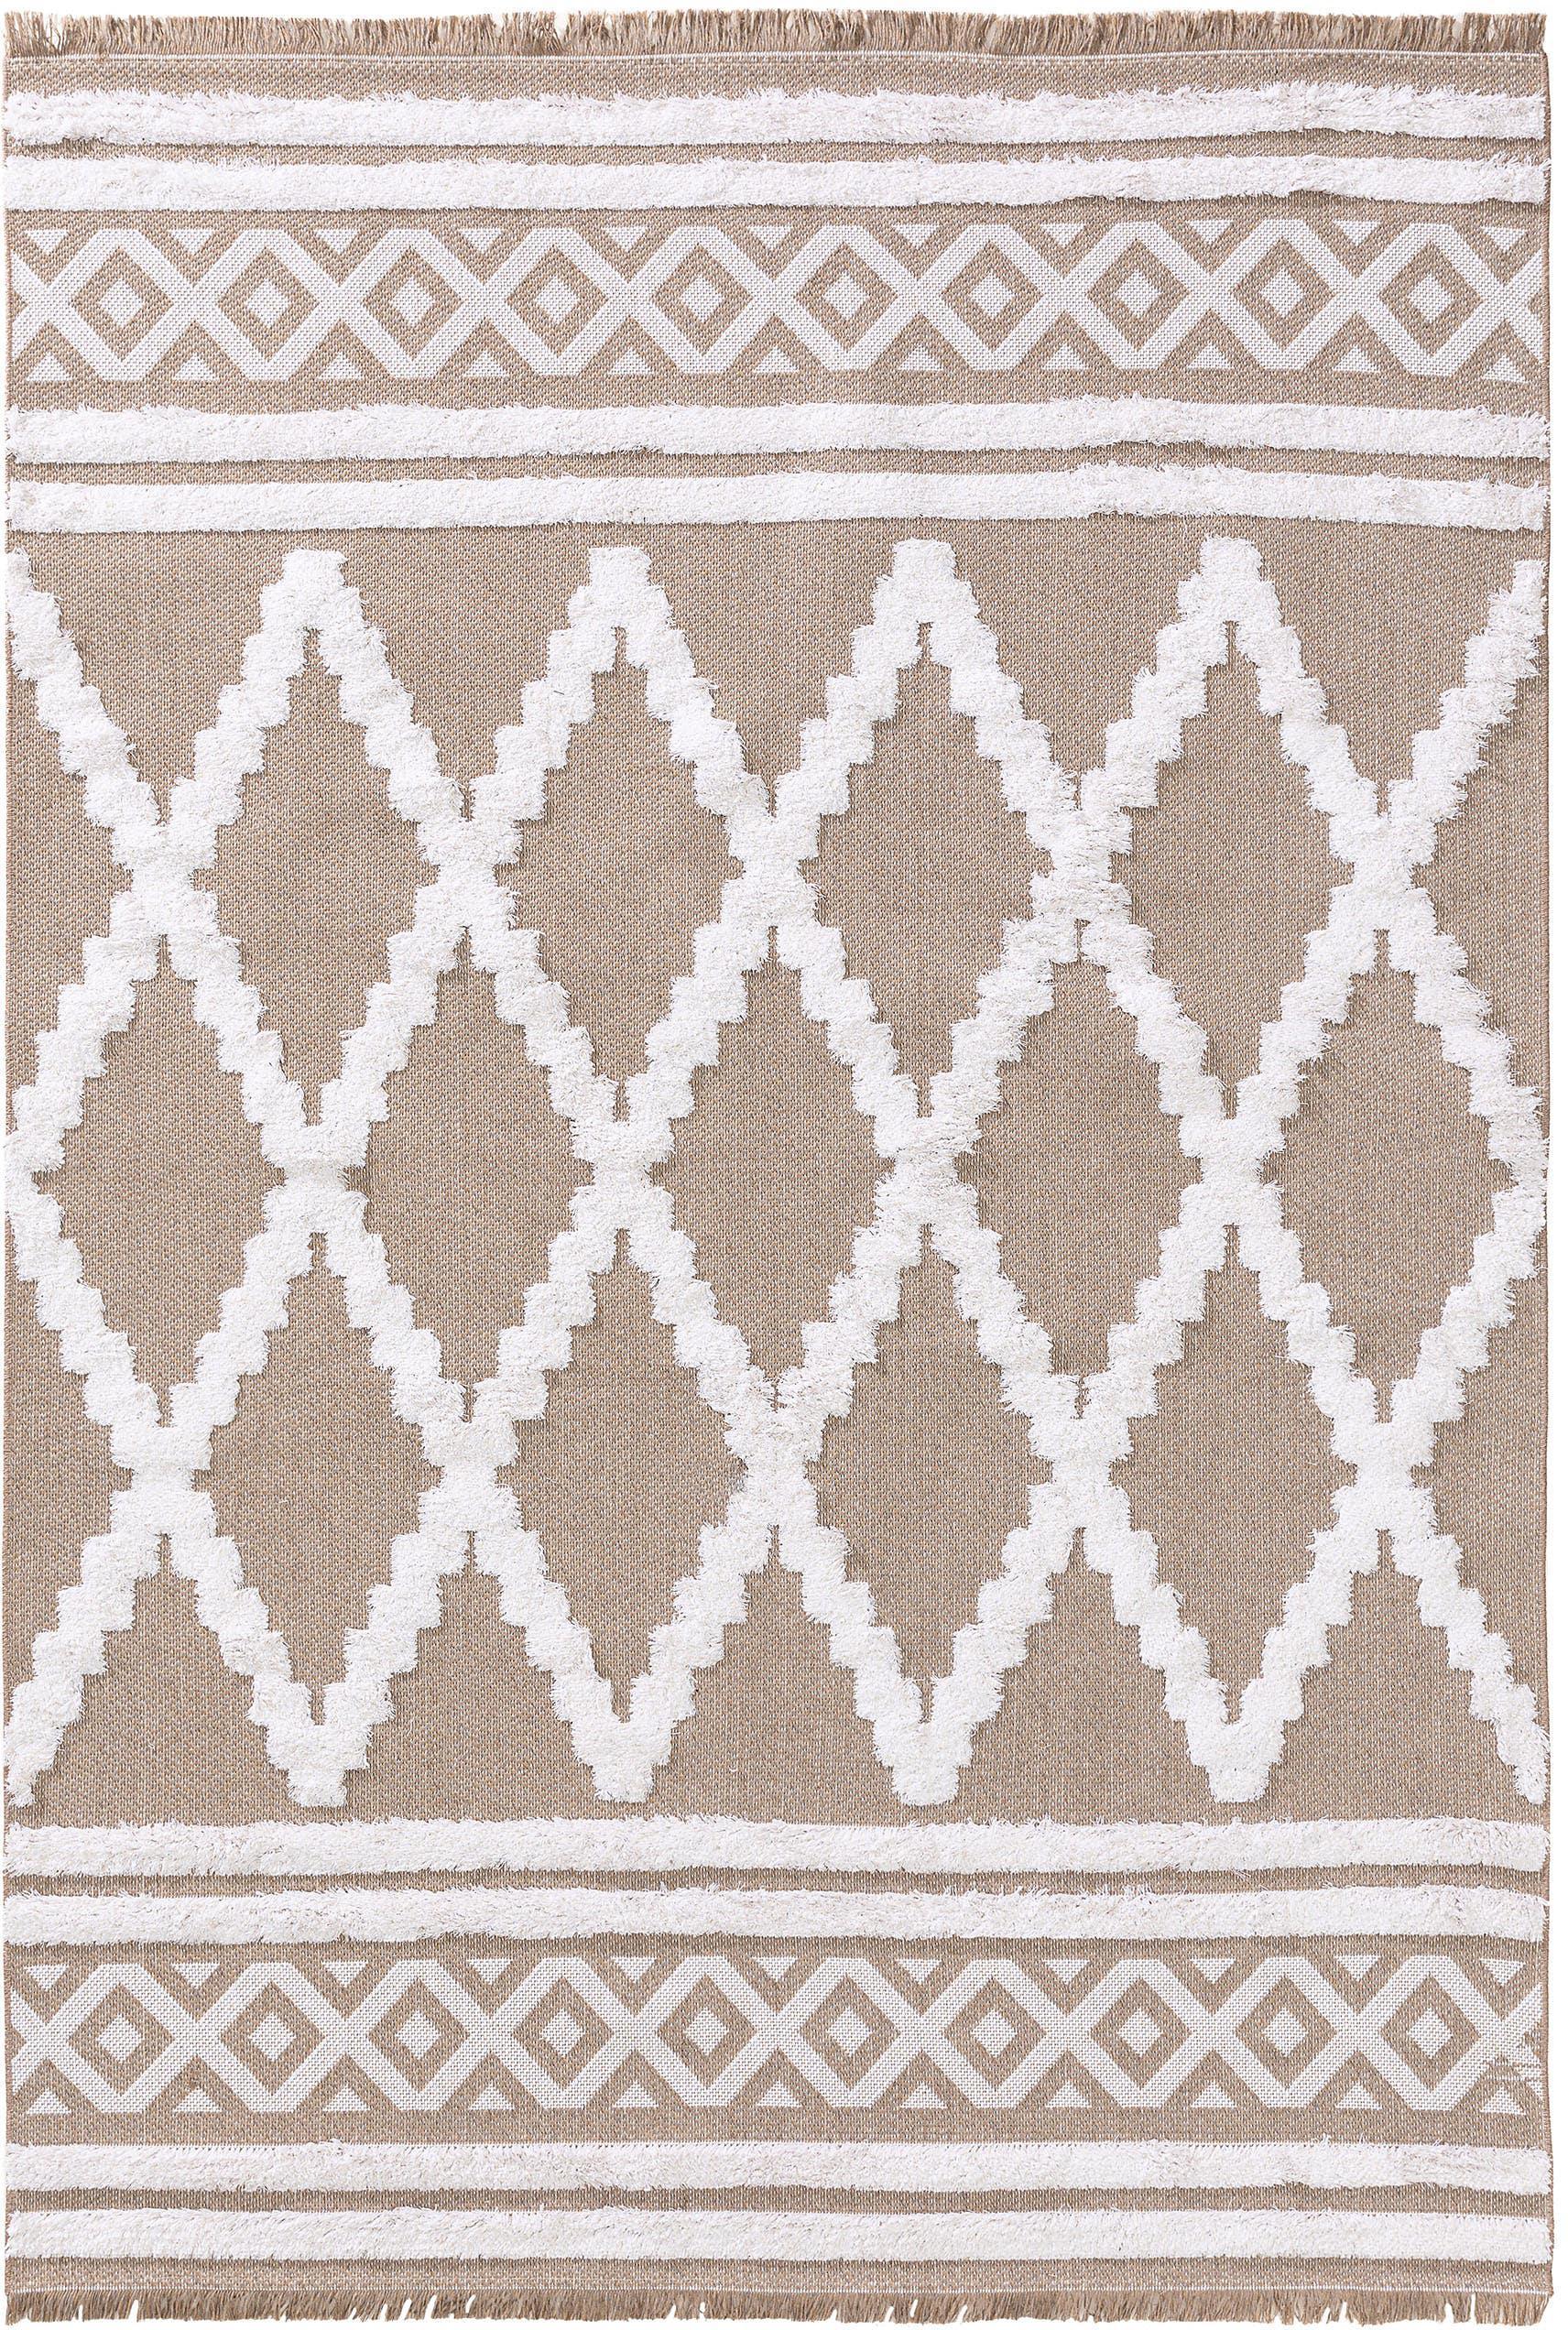 Alfombra lavable de algodón texturizada Oslo Karo, 100%algodón, Gris, blanco cremoso, An 190 x L 280 cm (Tamaño M)